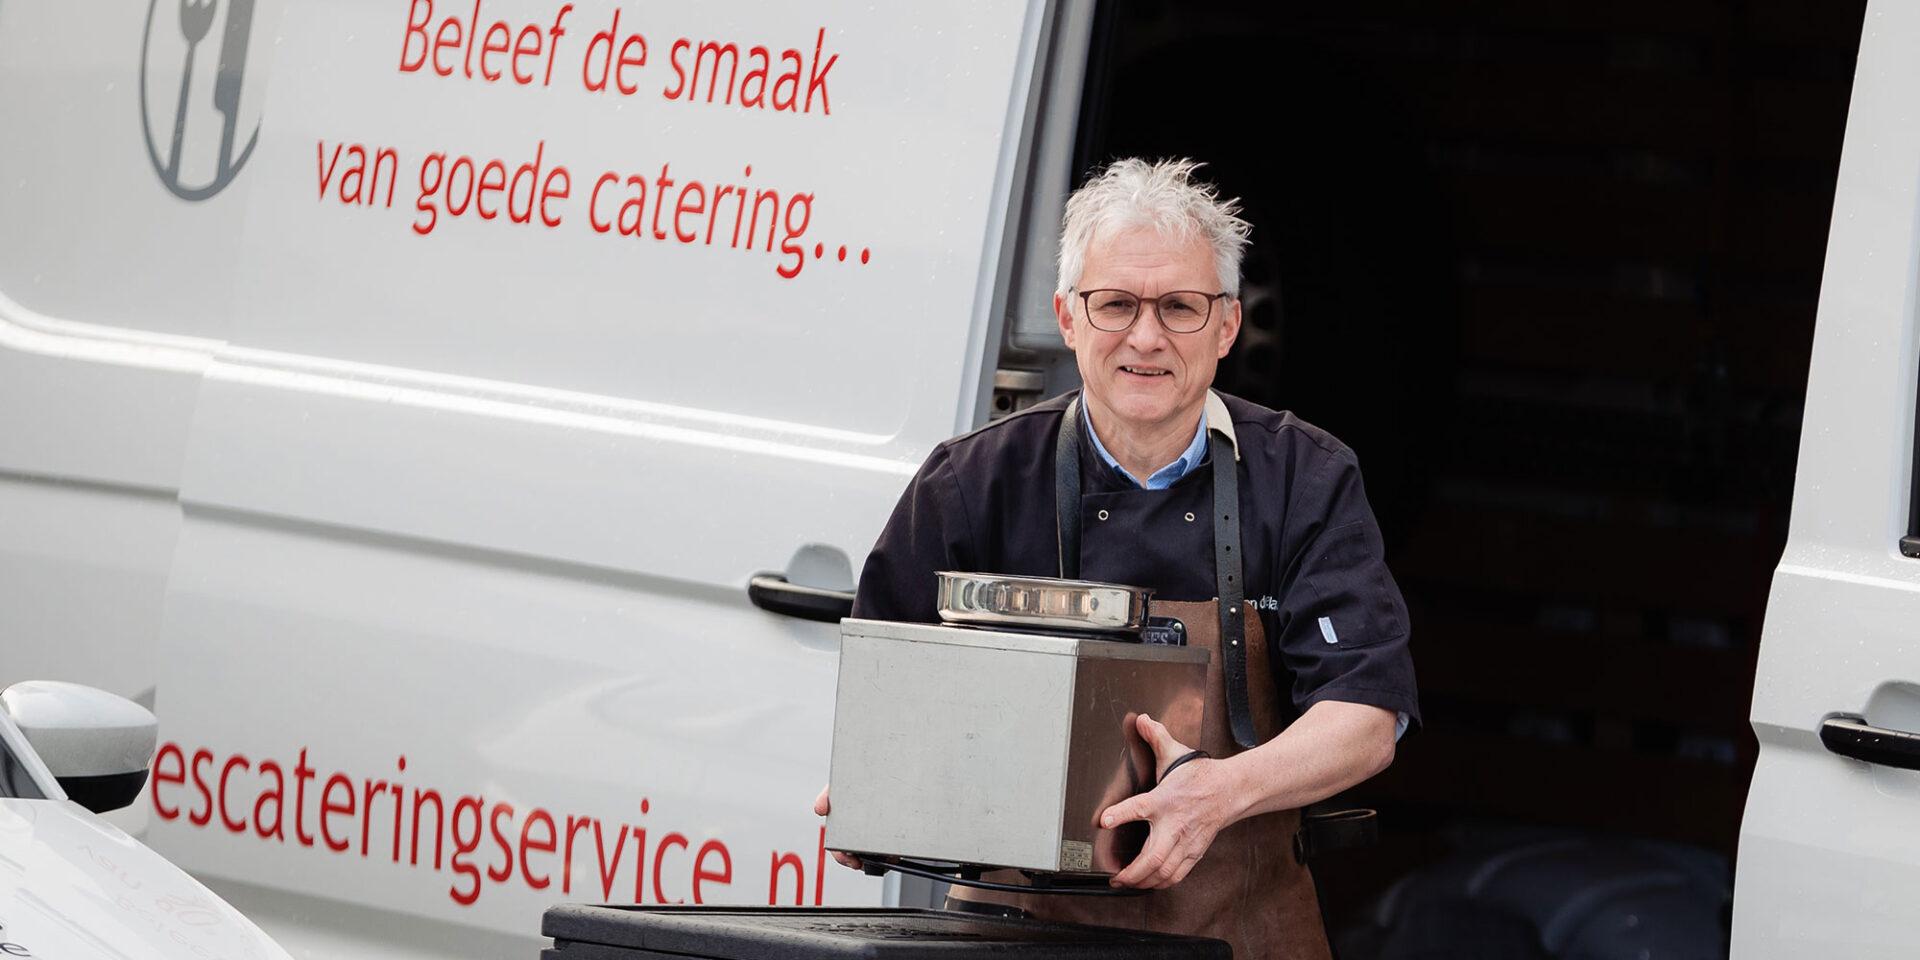 Bedrijfscatering DeMaes Cateringservice